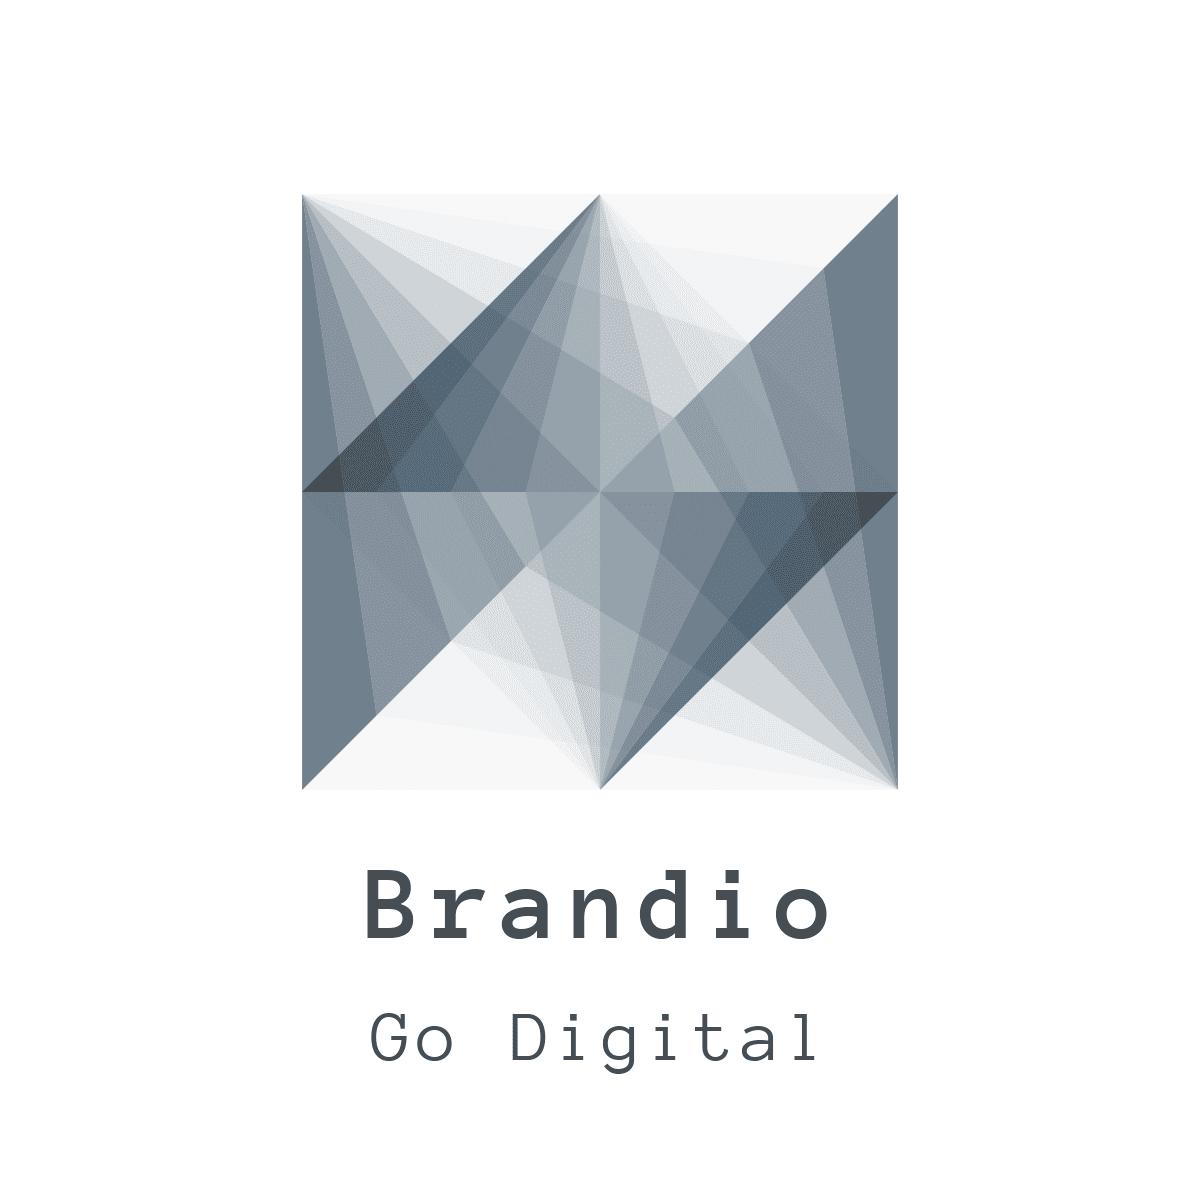 Brandio